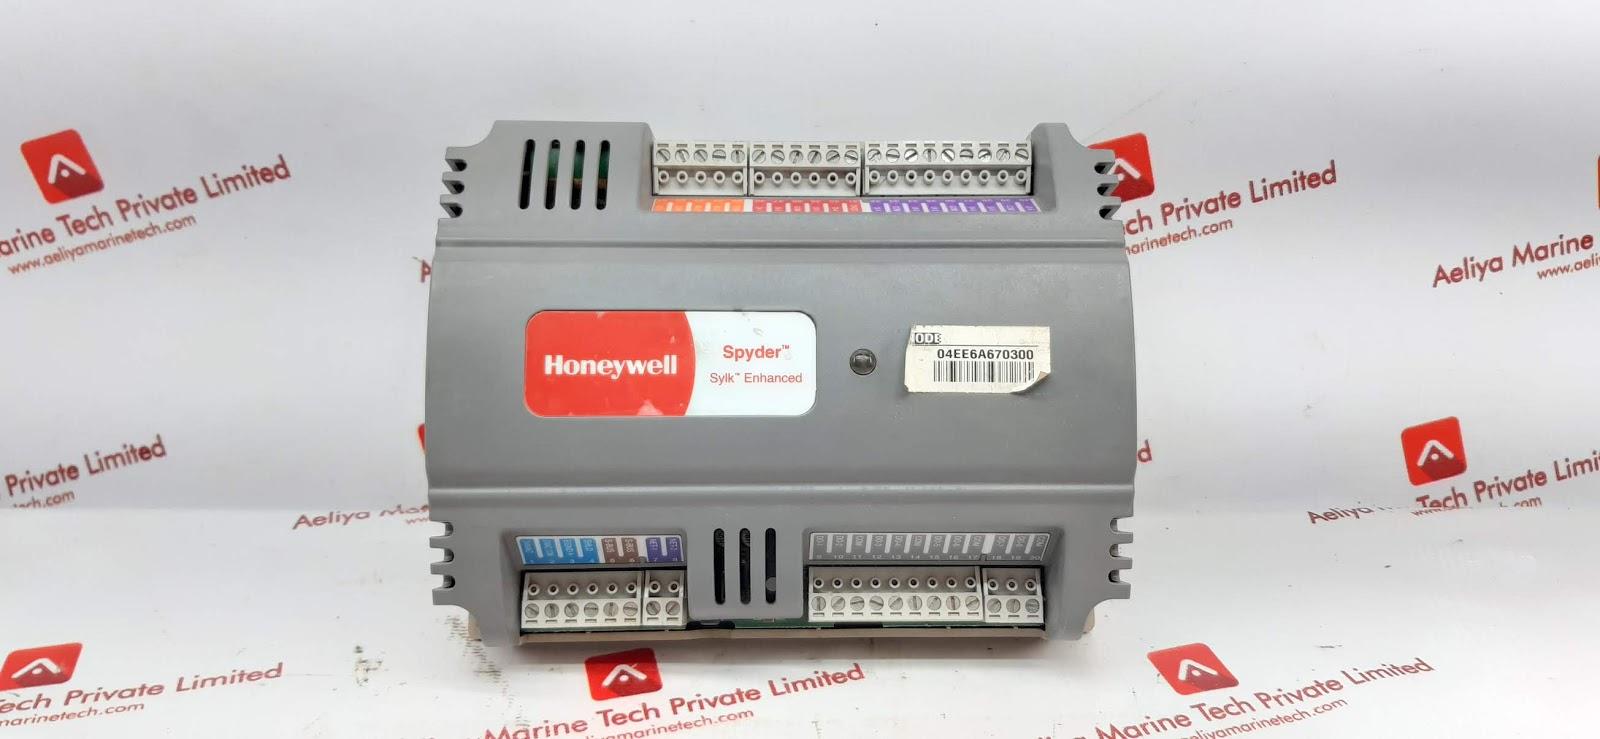 HONEYWELL PUL6438S SPYDER CONTROLLER | AELIYA MARINE TECH PVT LTD